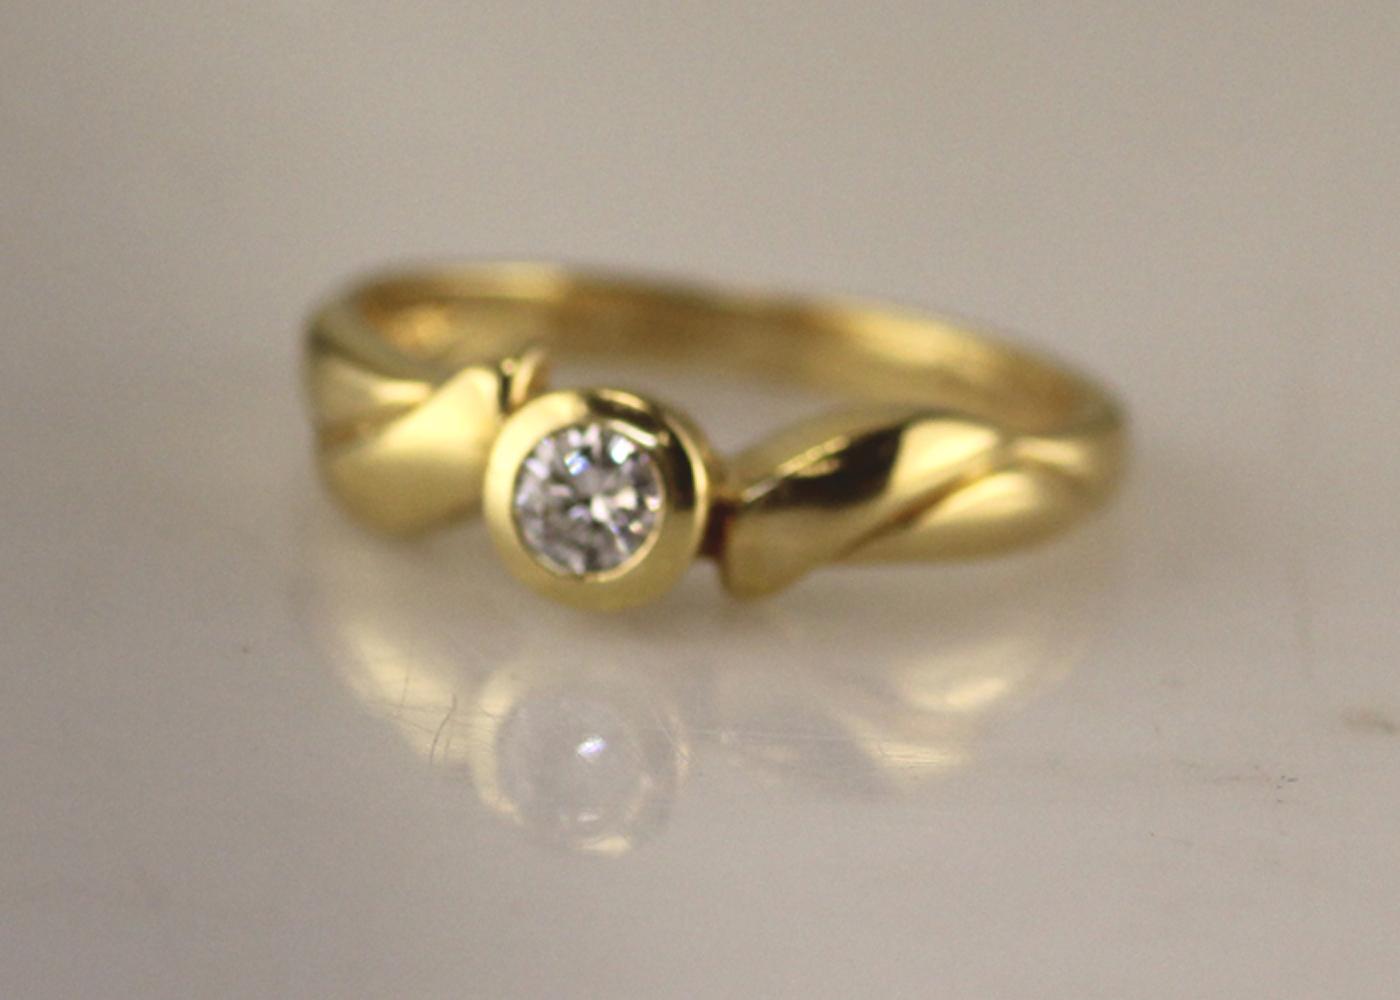 18ct Rub Over Set Diamond Ring 0.17 Carats - Image 5 of 7